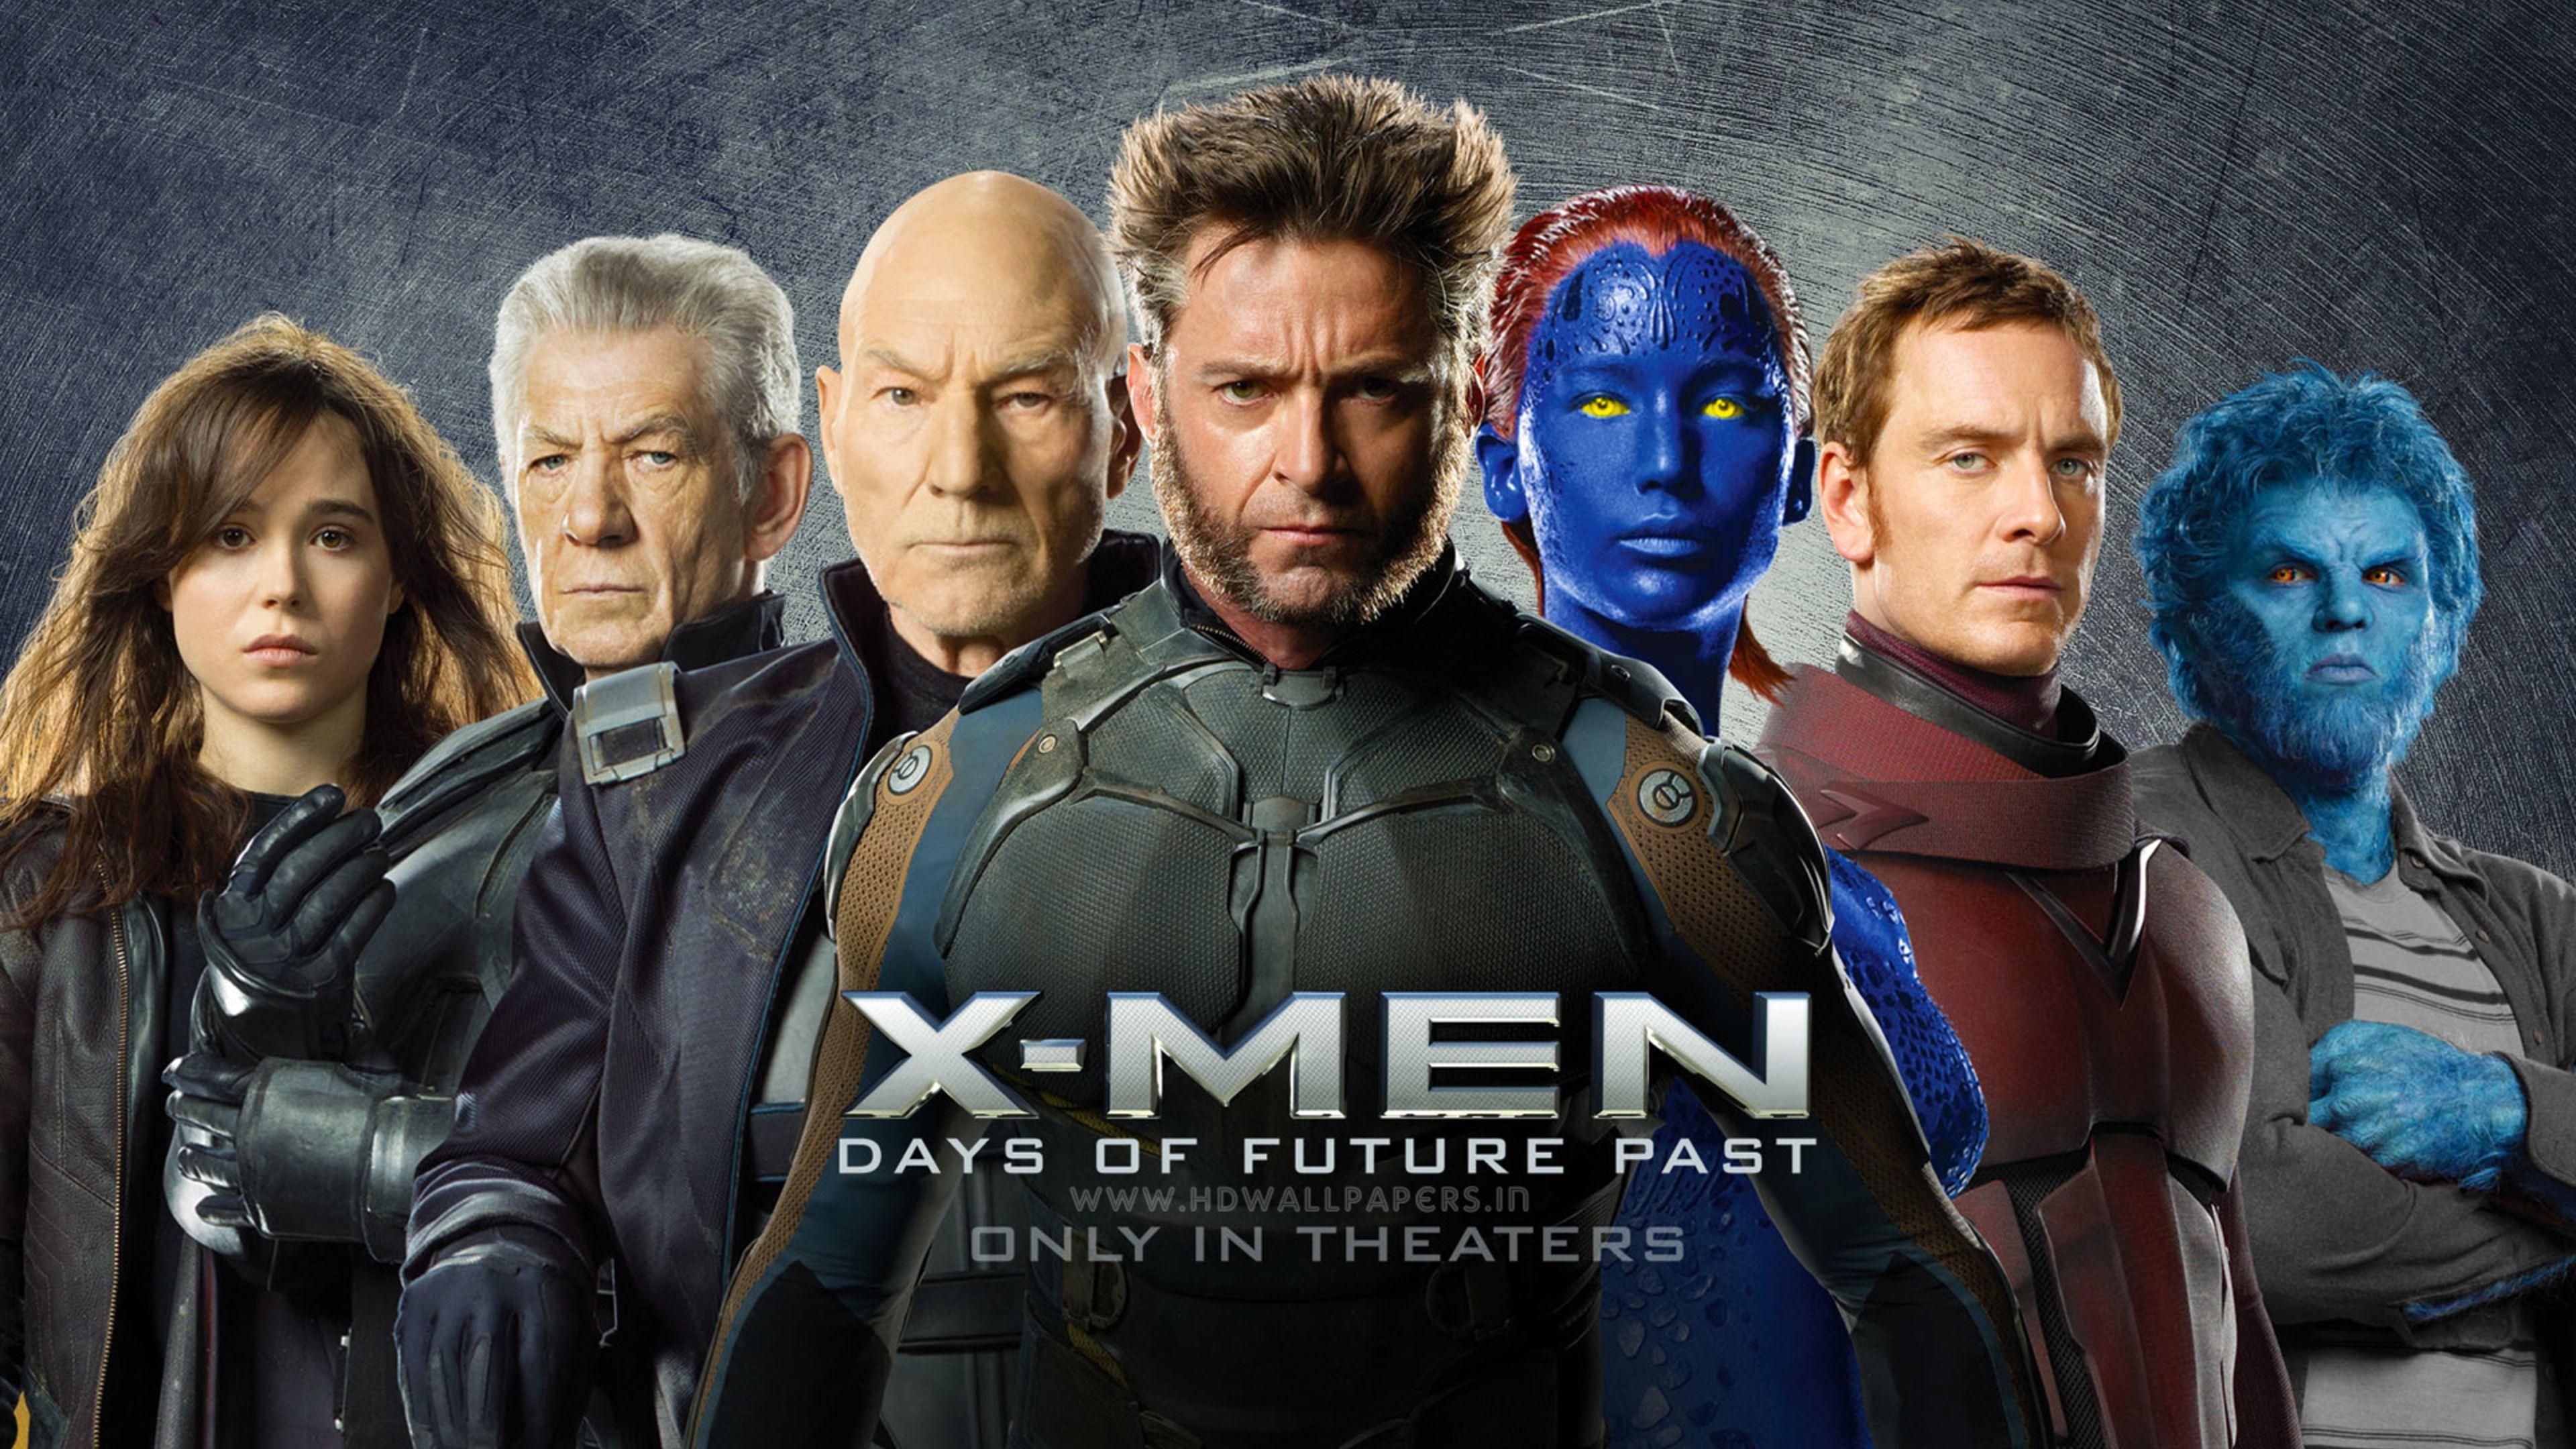 X Men Days Of Future Past Movies Hd K Wallpapers Days Of Future Past X Men Movies